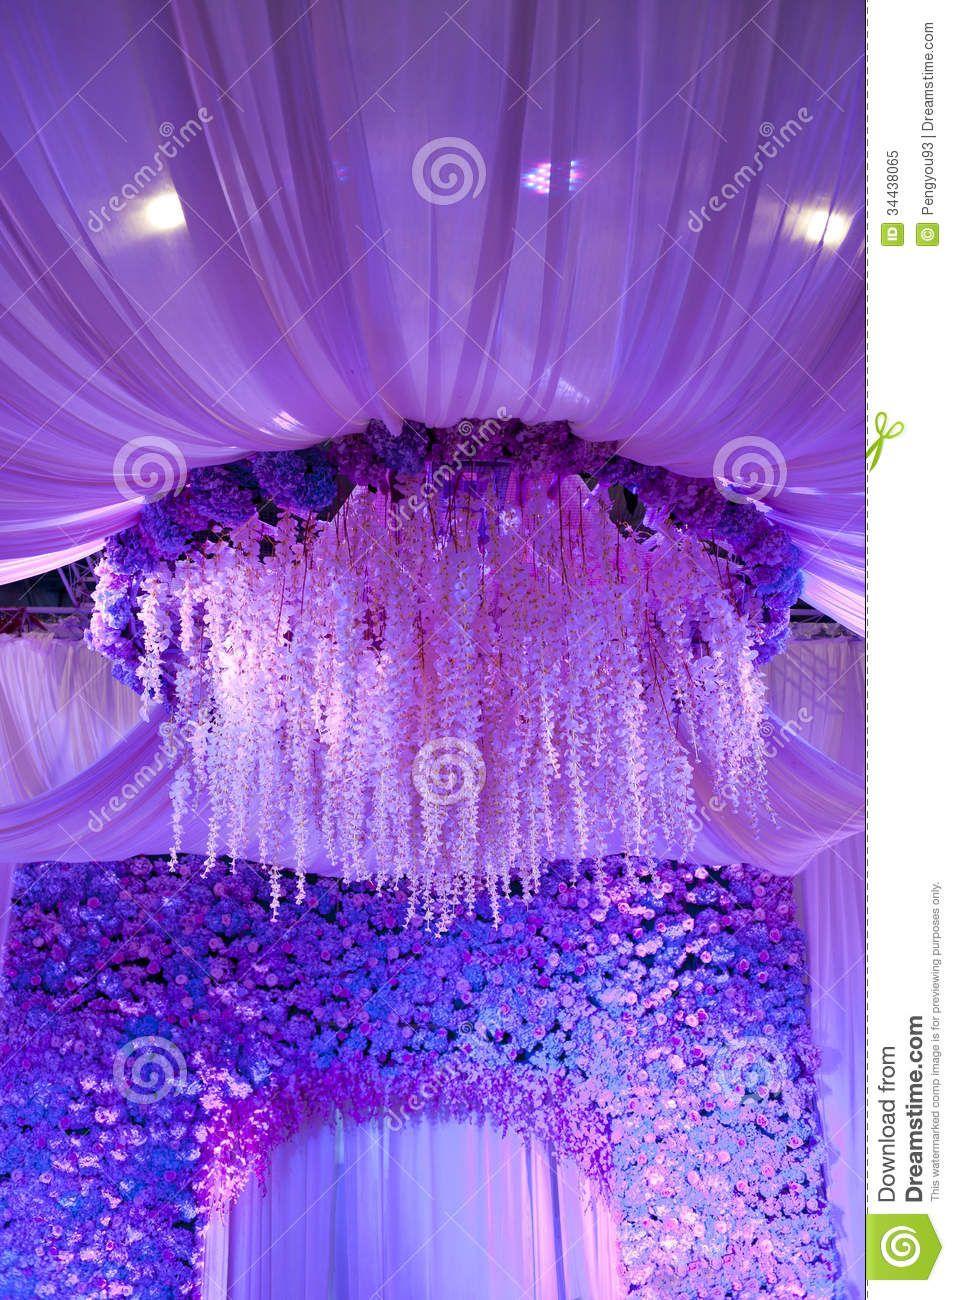 Purple wedding stage decor wedding decor pinterest wedding purple wedding stage decor junglespirit Image collections